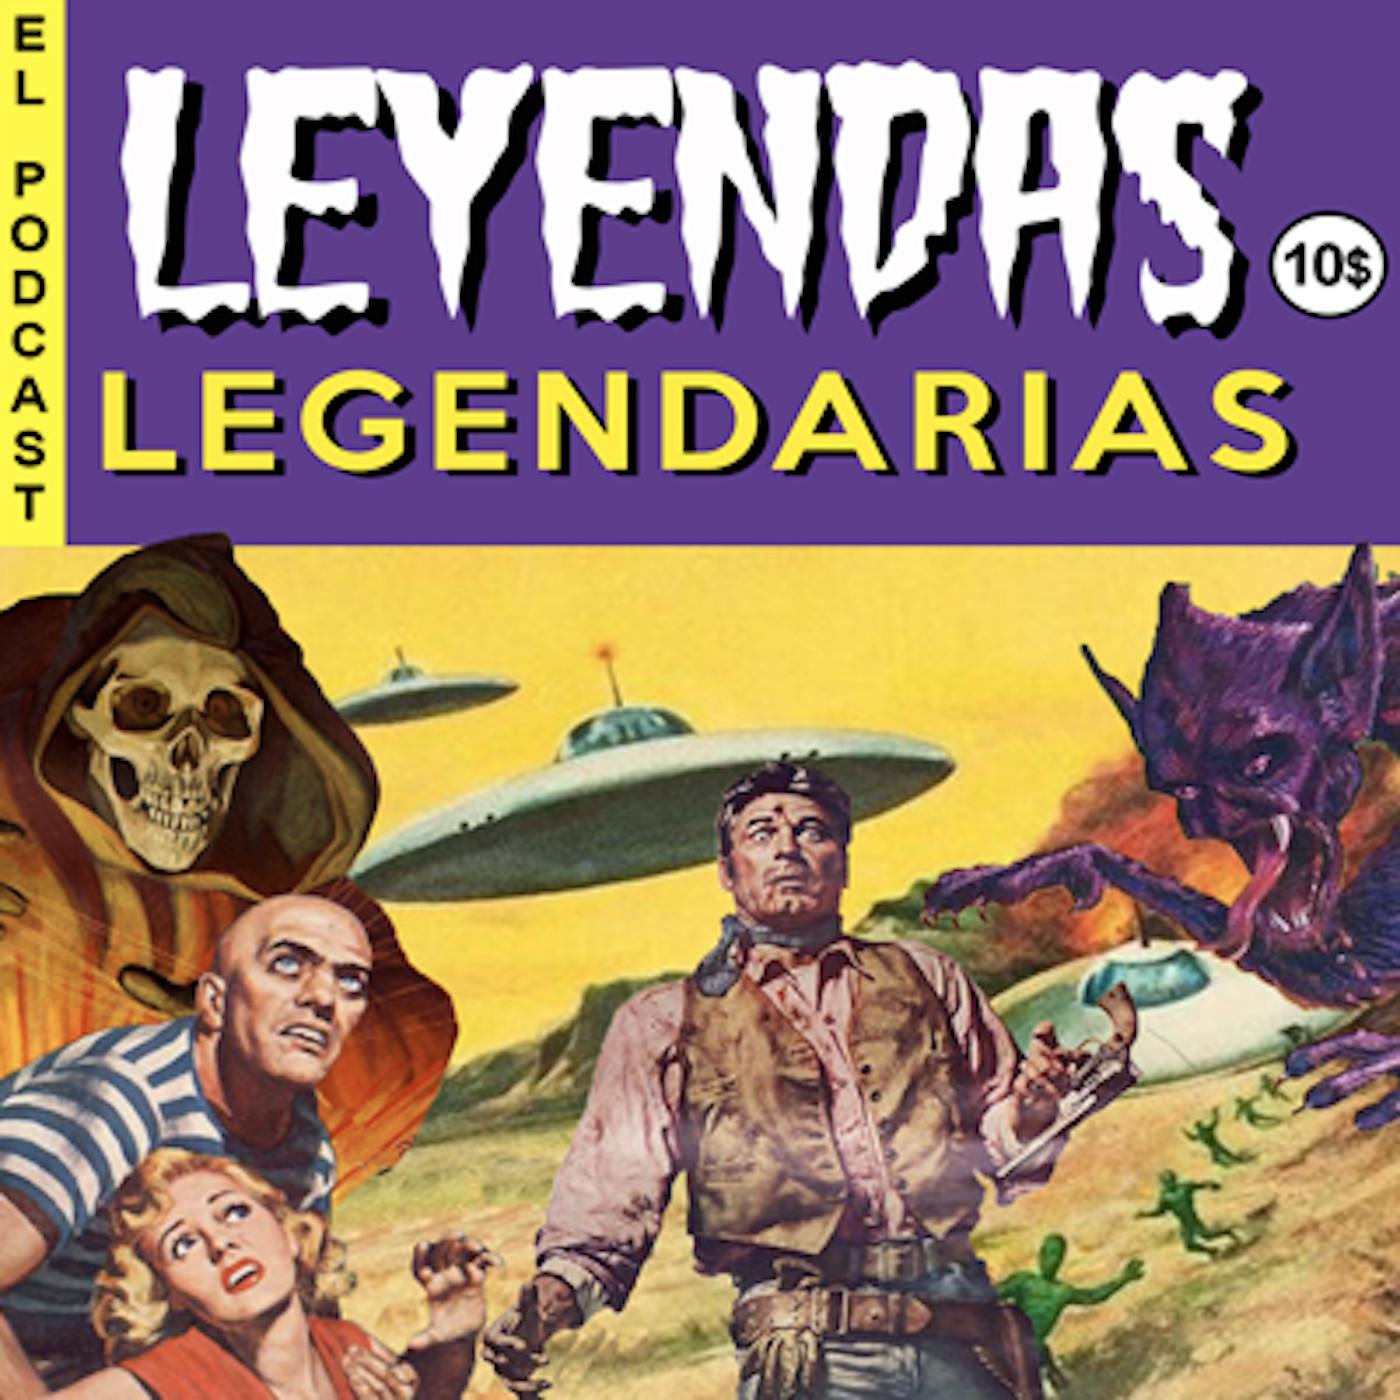 Leyendas Legendarias show art